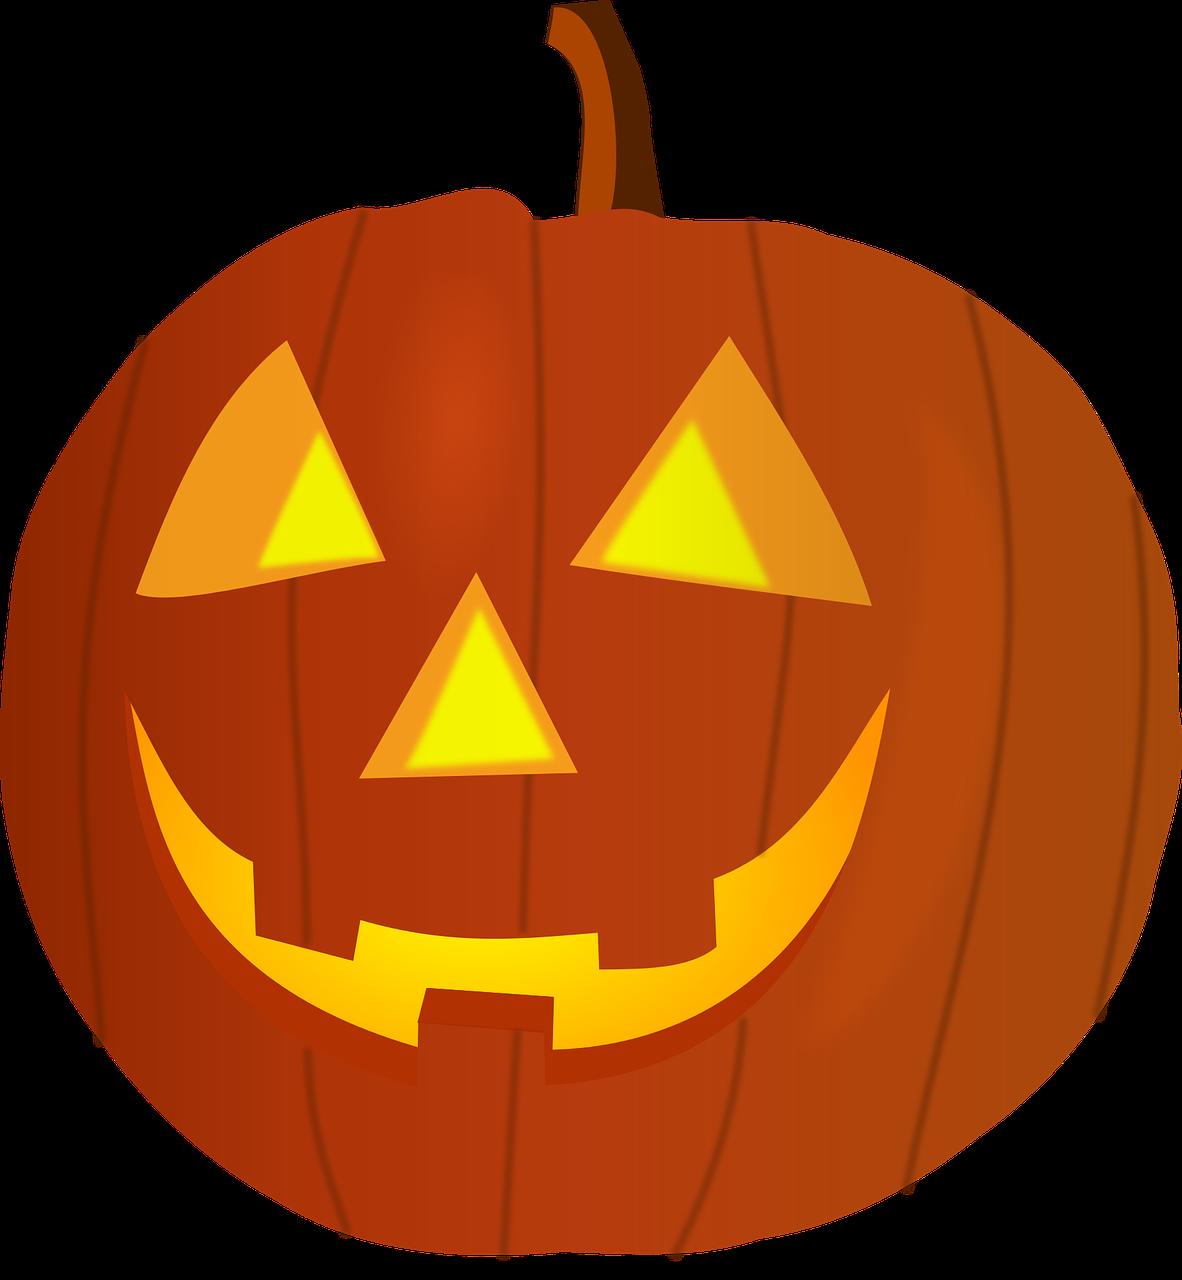 1182x1280 Jack O' Lantern Pumpkin Halloween Carving Clip Art